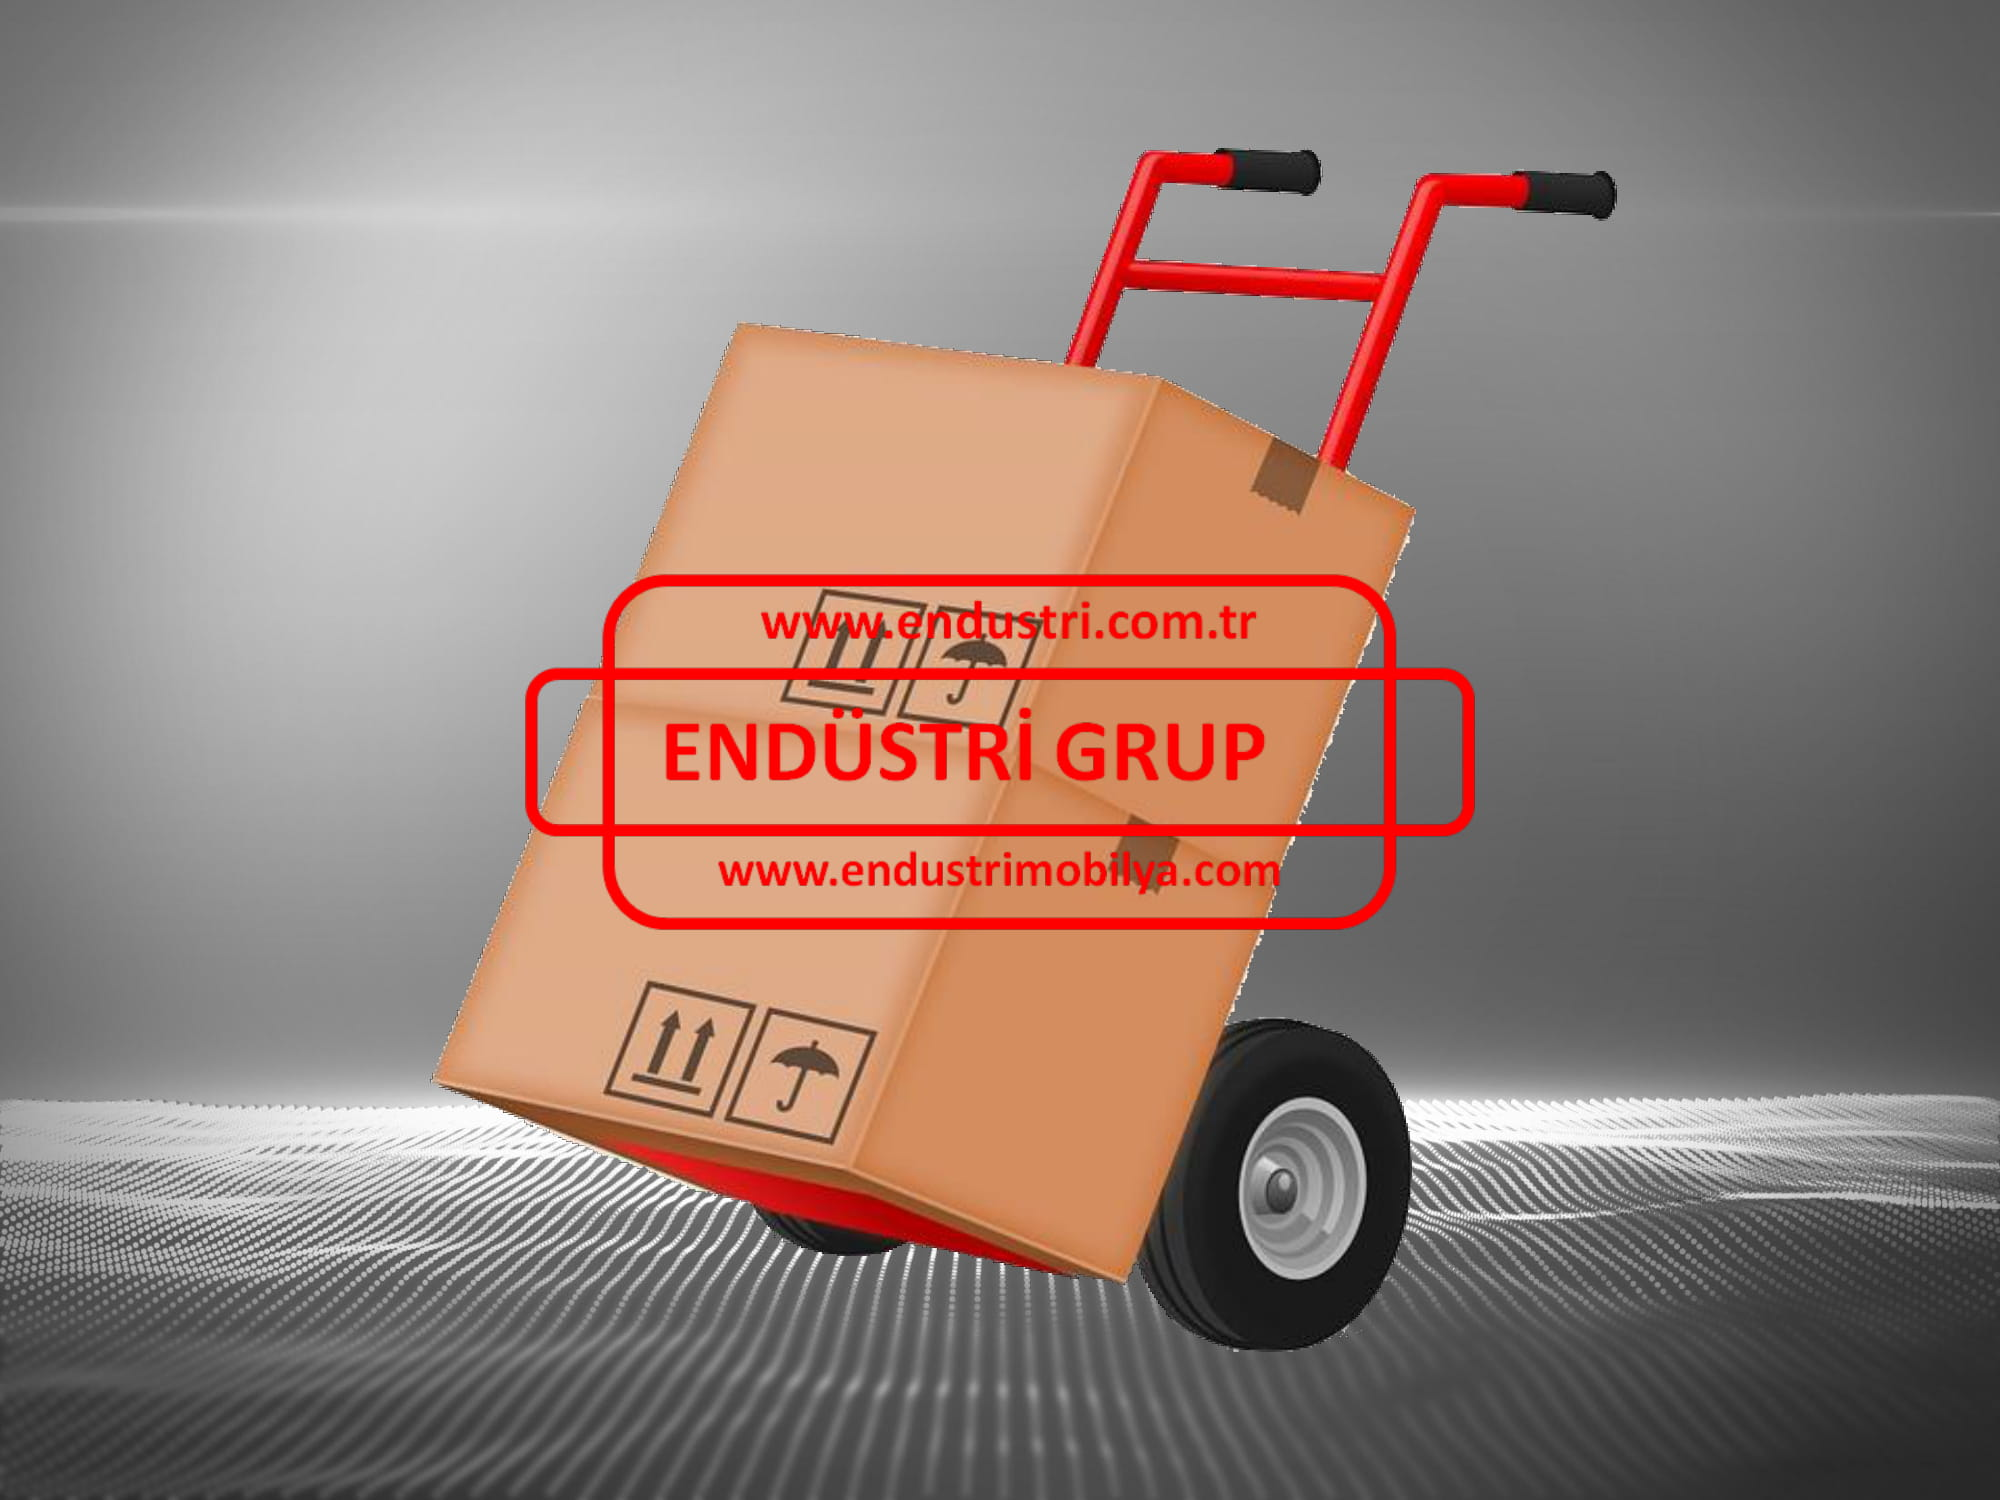 tekerlekli-koli-kutu-kargo-karton-paket-sevkiyat-metal-tasima-arabasi-arabalari-imalati-fiyati